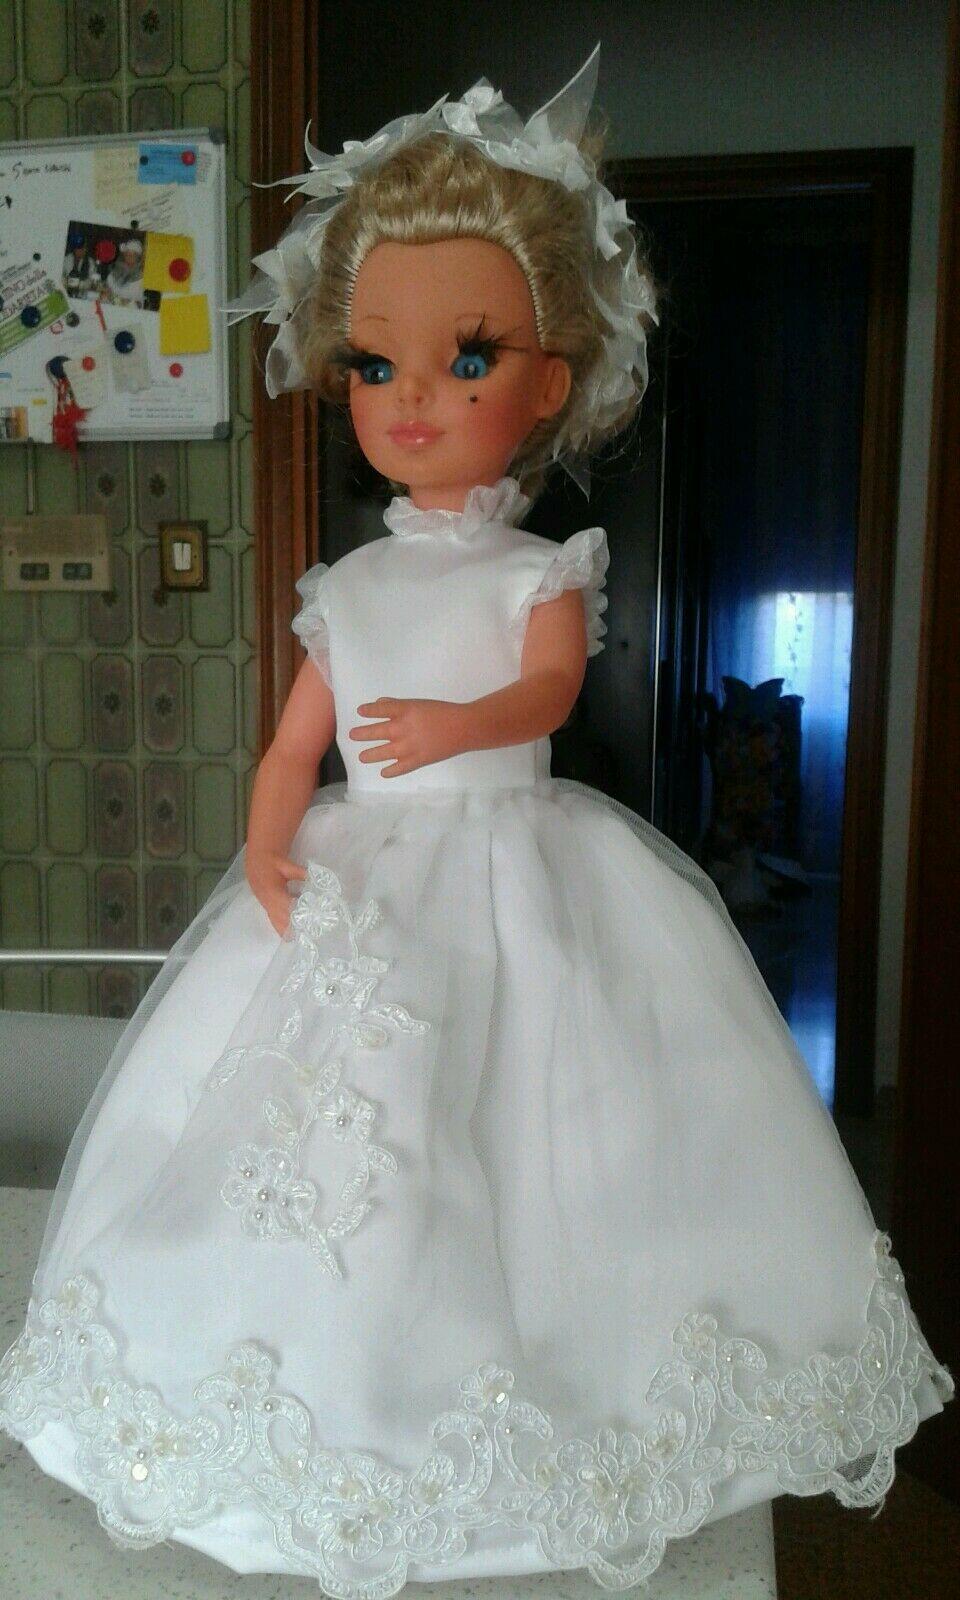 Dettagli su ALTA MODA FURGA 4S SIMONA BIONDA BELLISSIMA #bridedolls